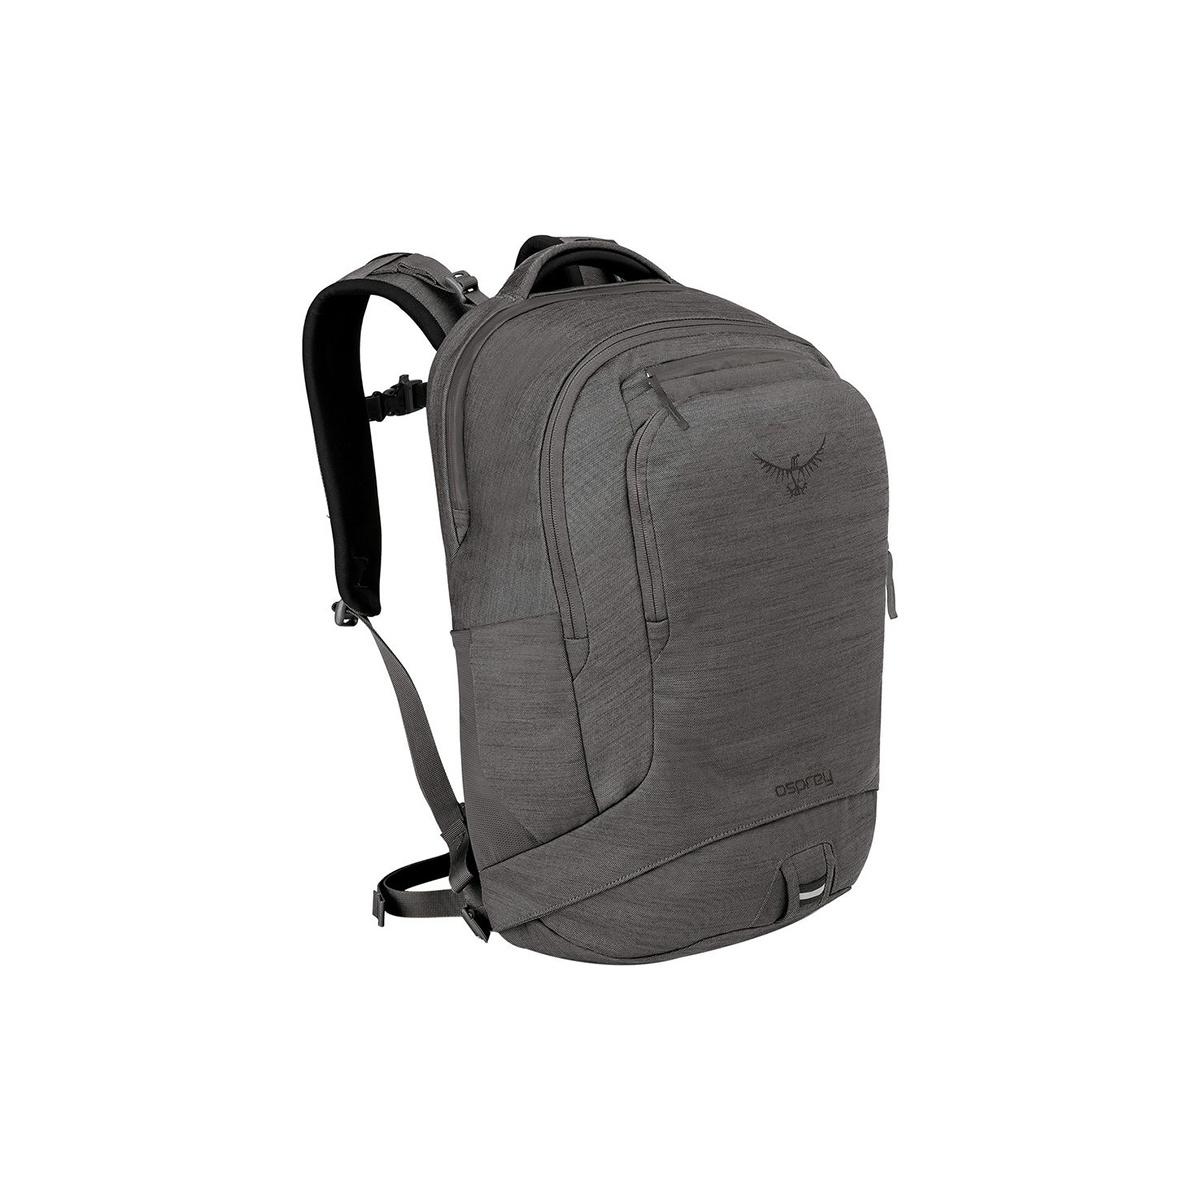 Osprey Packs Cyber